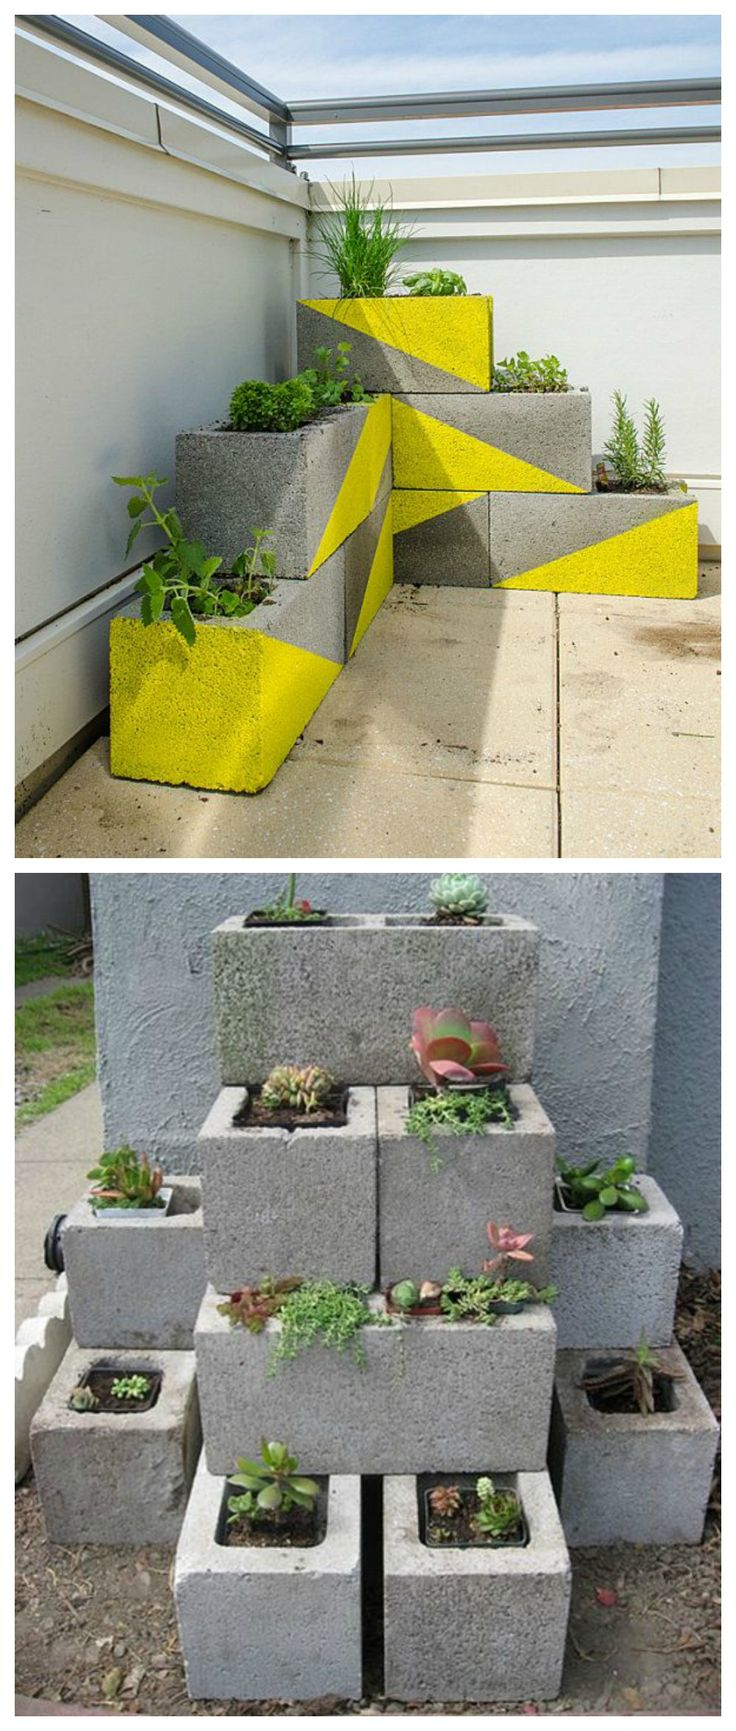 17 mejores ideas sobre bloques de hormig n en pinterest for Jardineras para patio casa